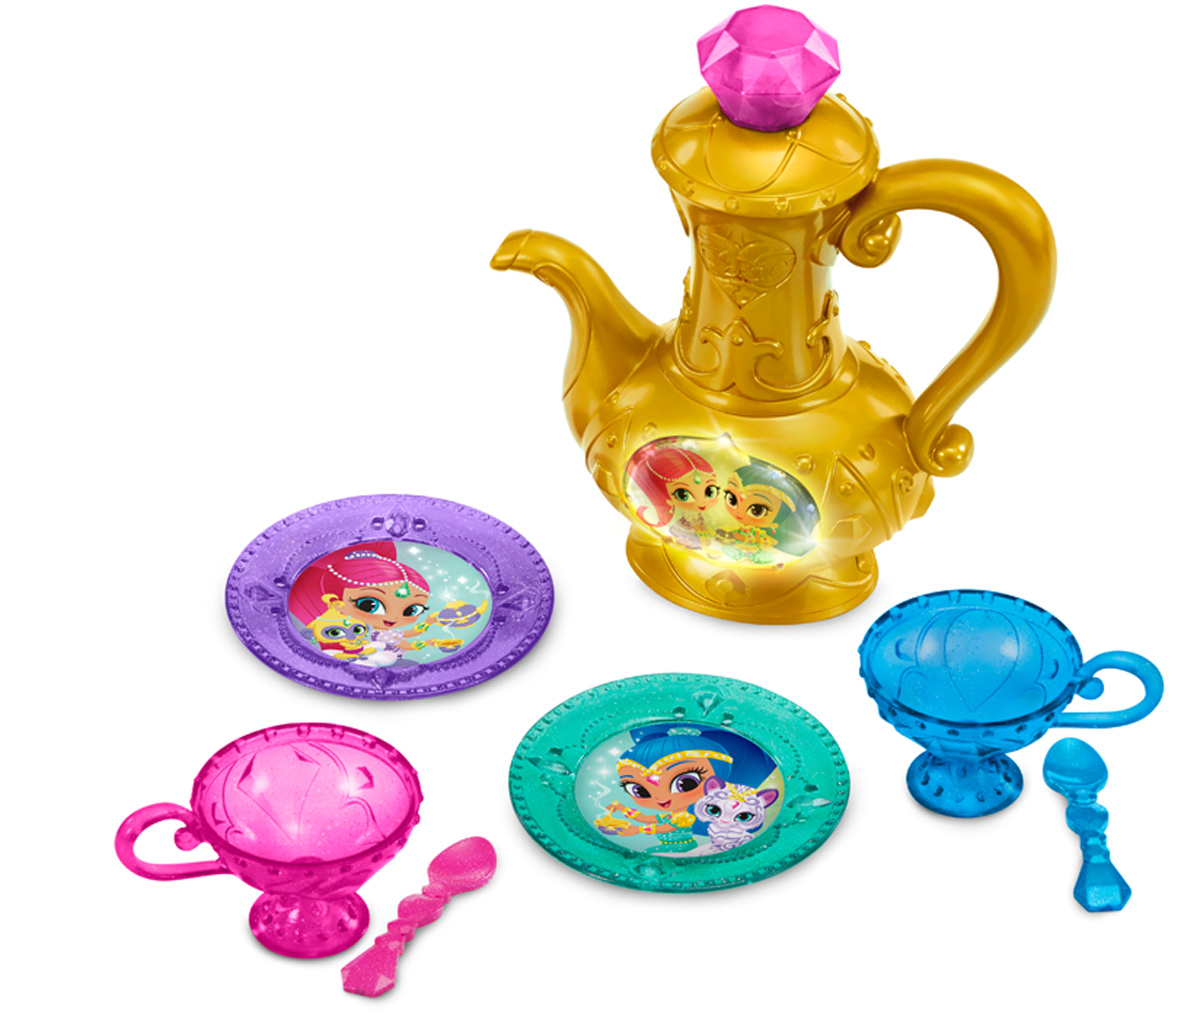 Shimmer & Shine Игровой набор Волшебное чаепитие shimmer & shine набор фигурок тала и нала